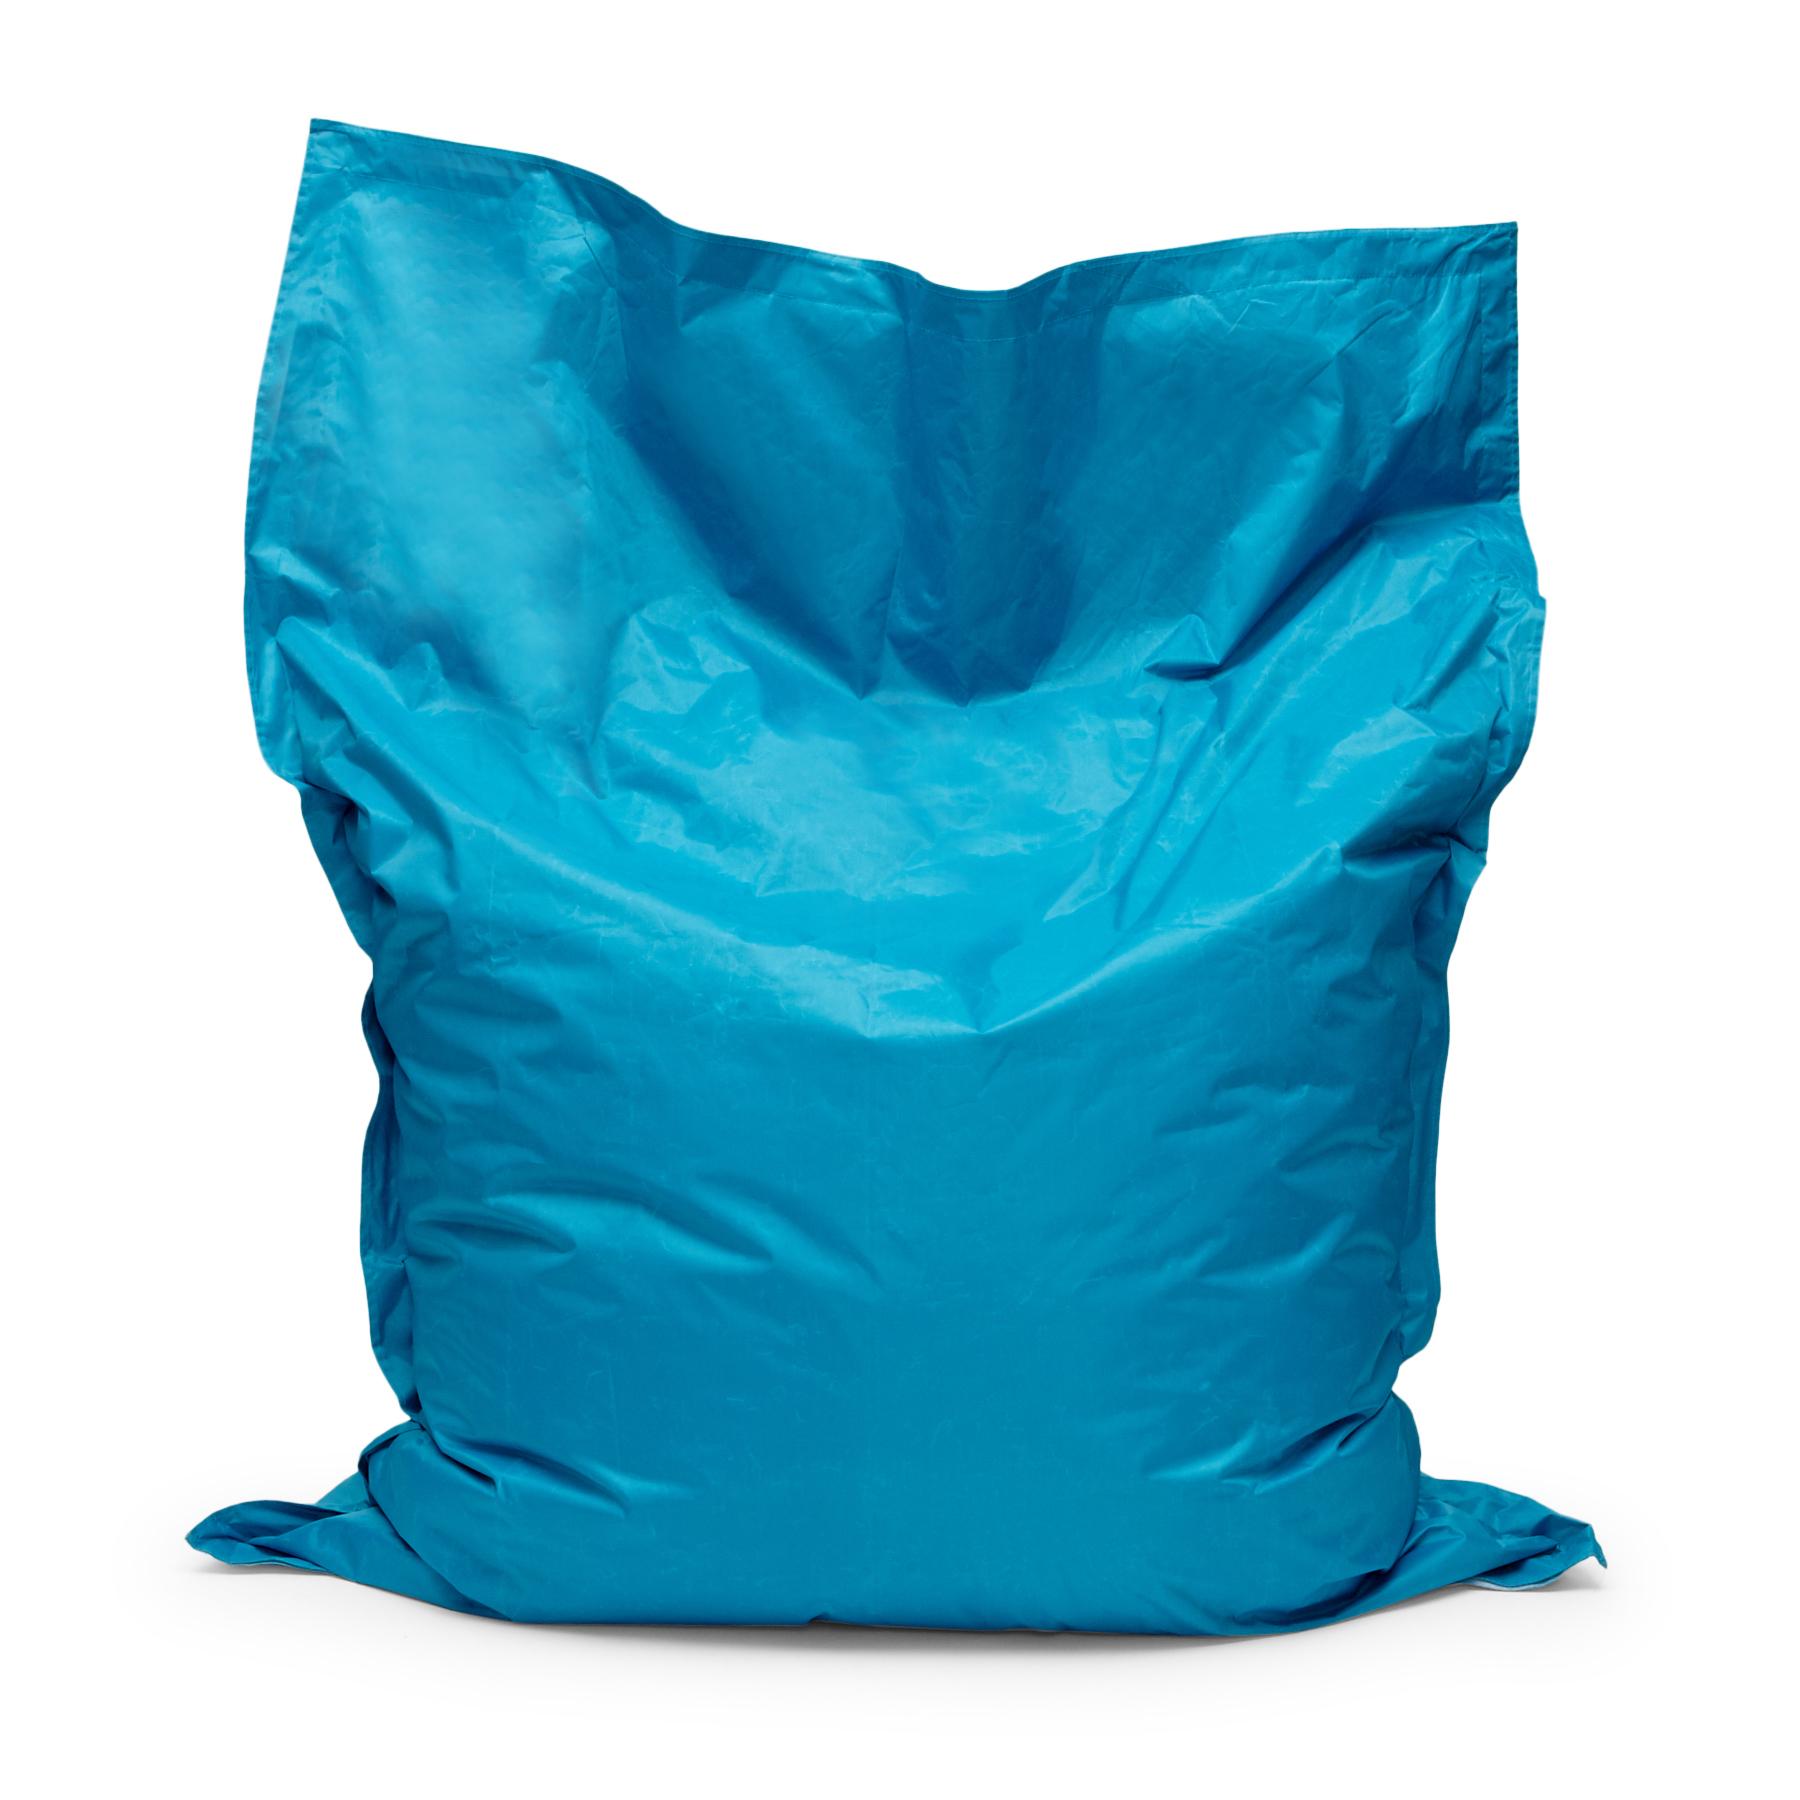 Blue Bean Bag Large Beanbag